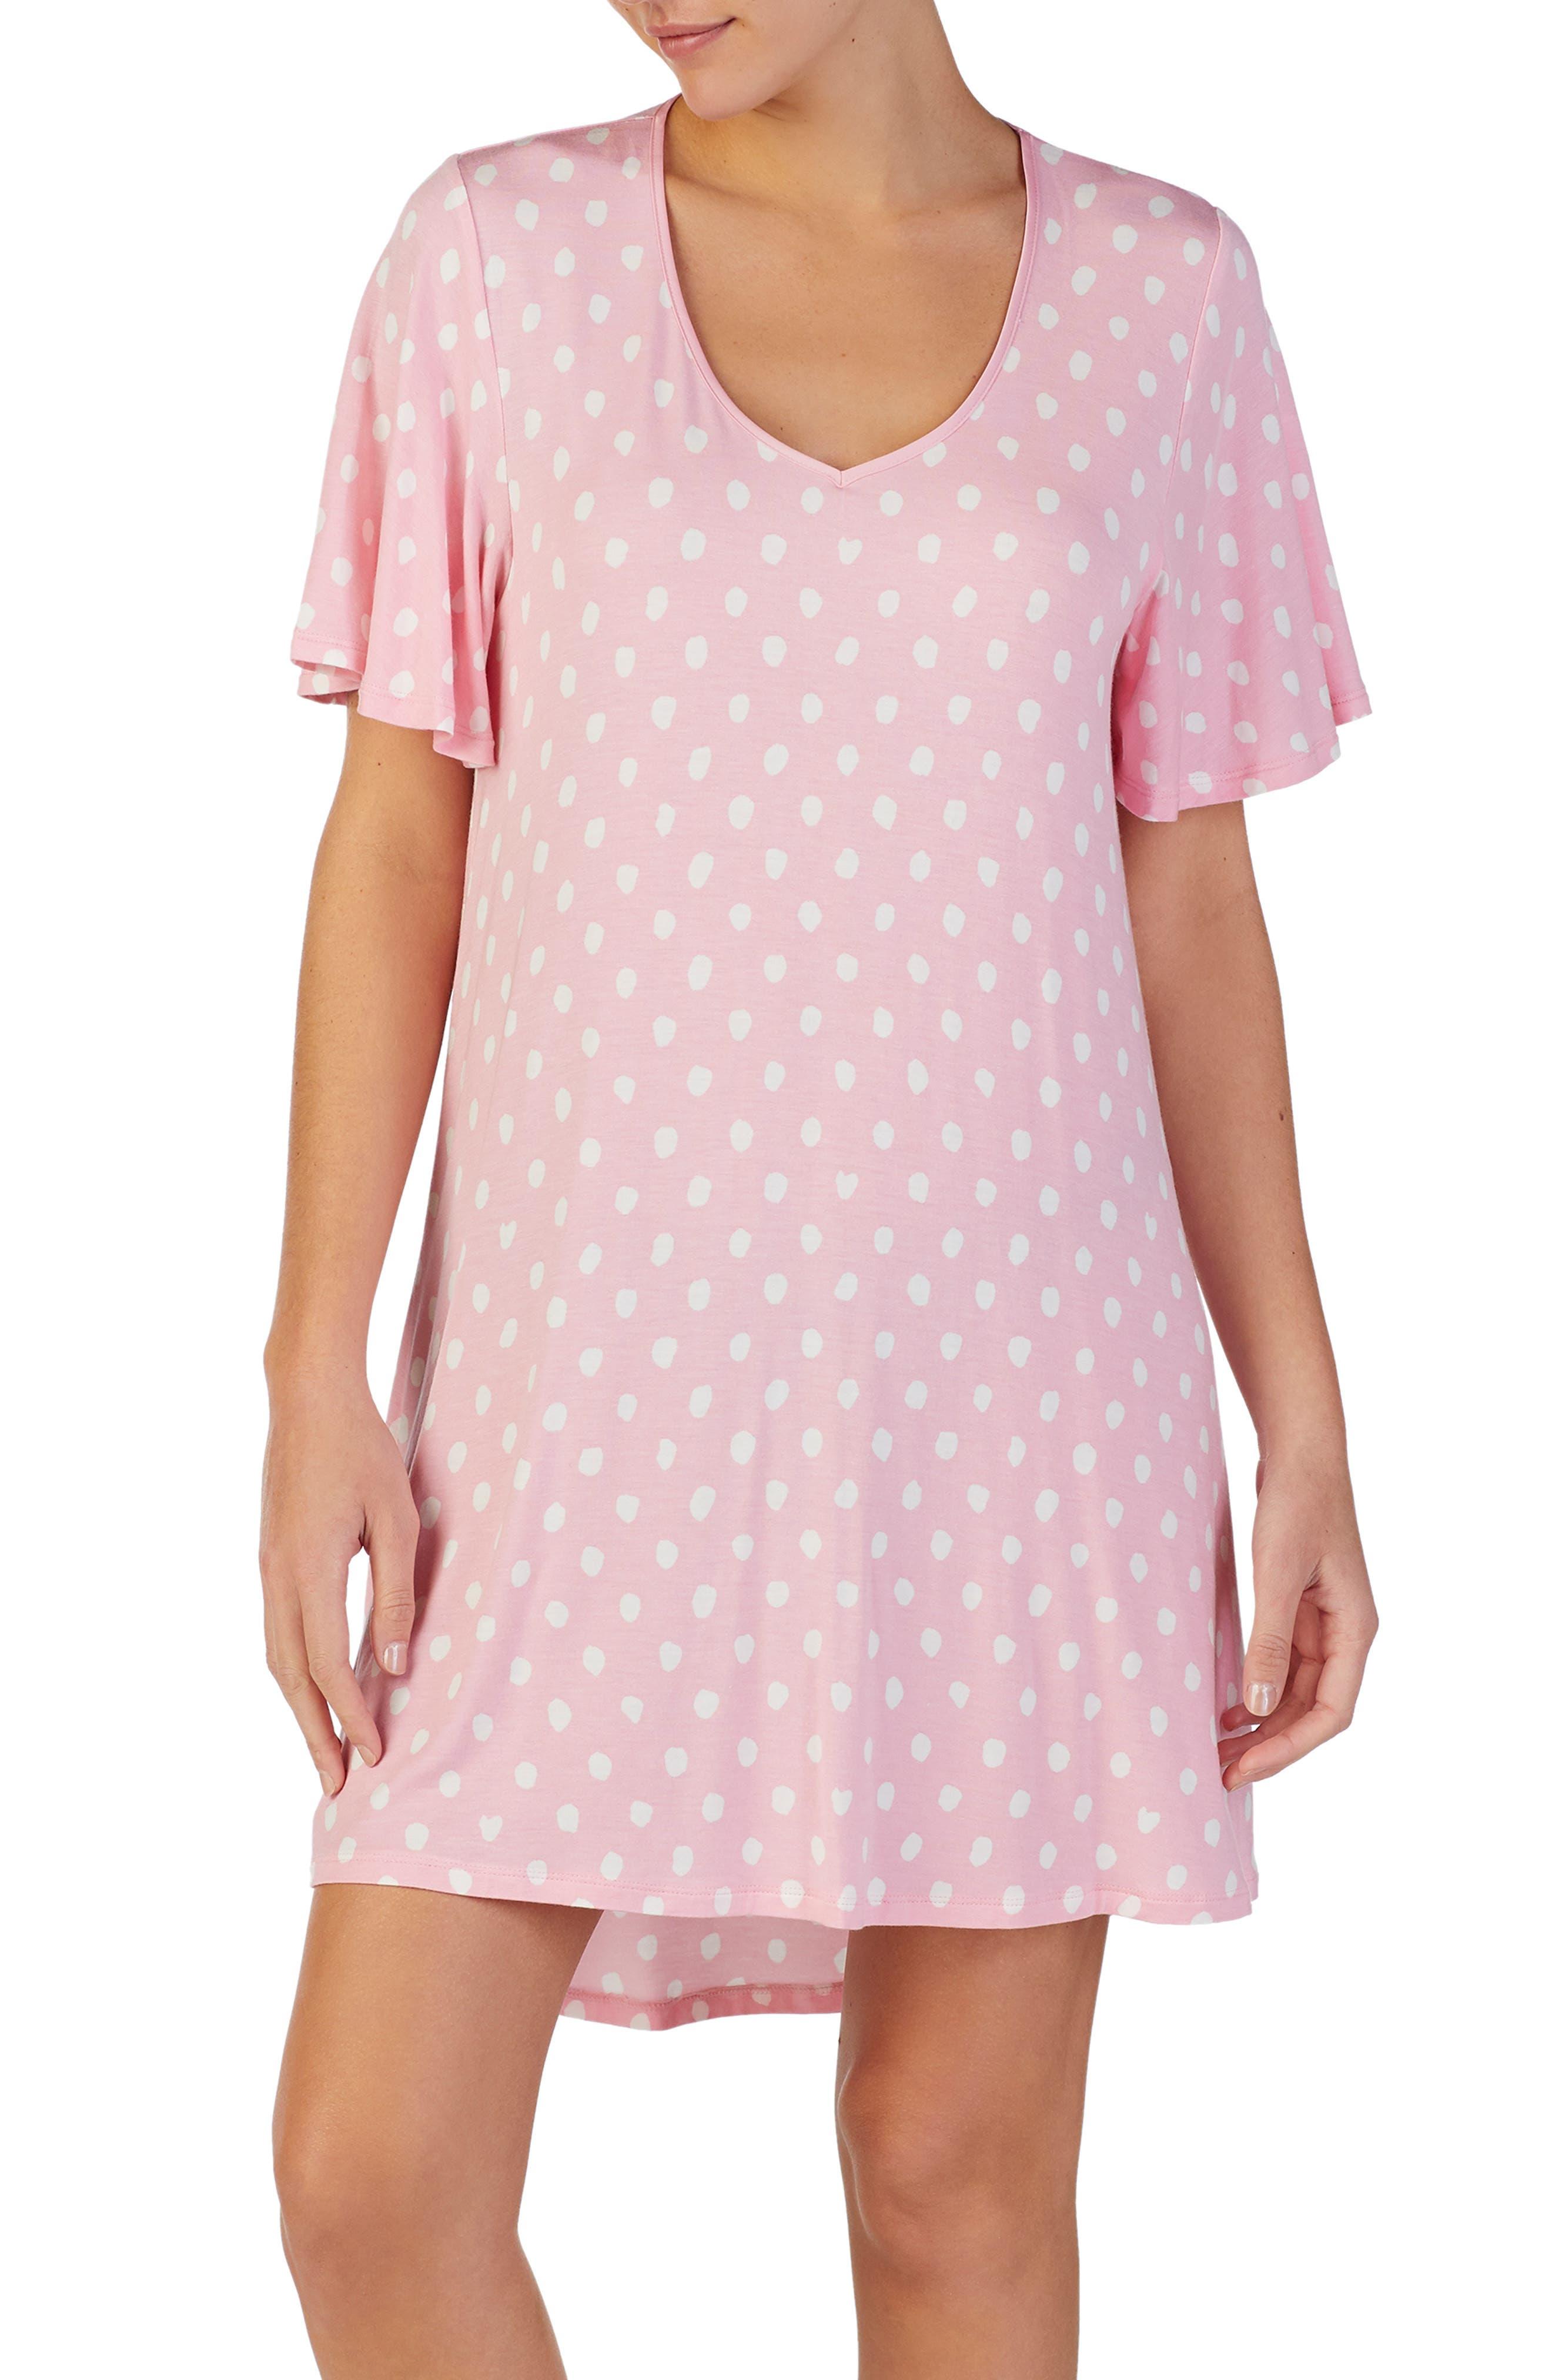 Kate Spade New York Short Nightgown